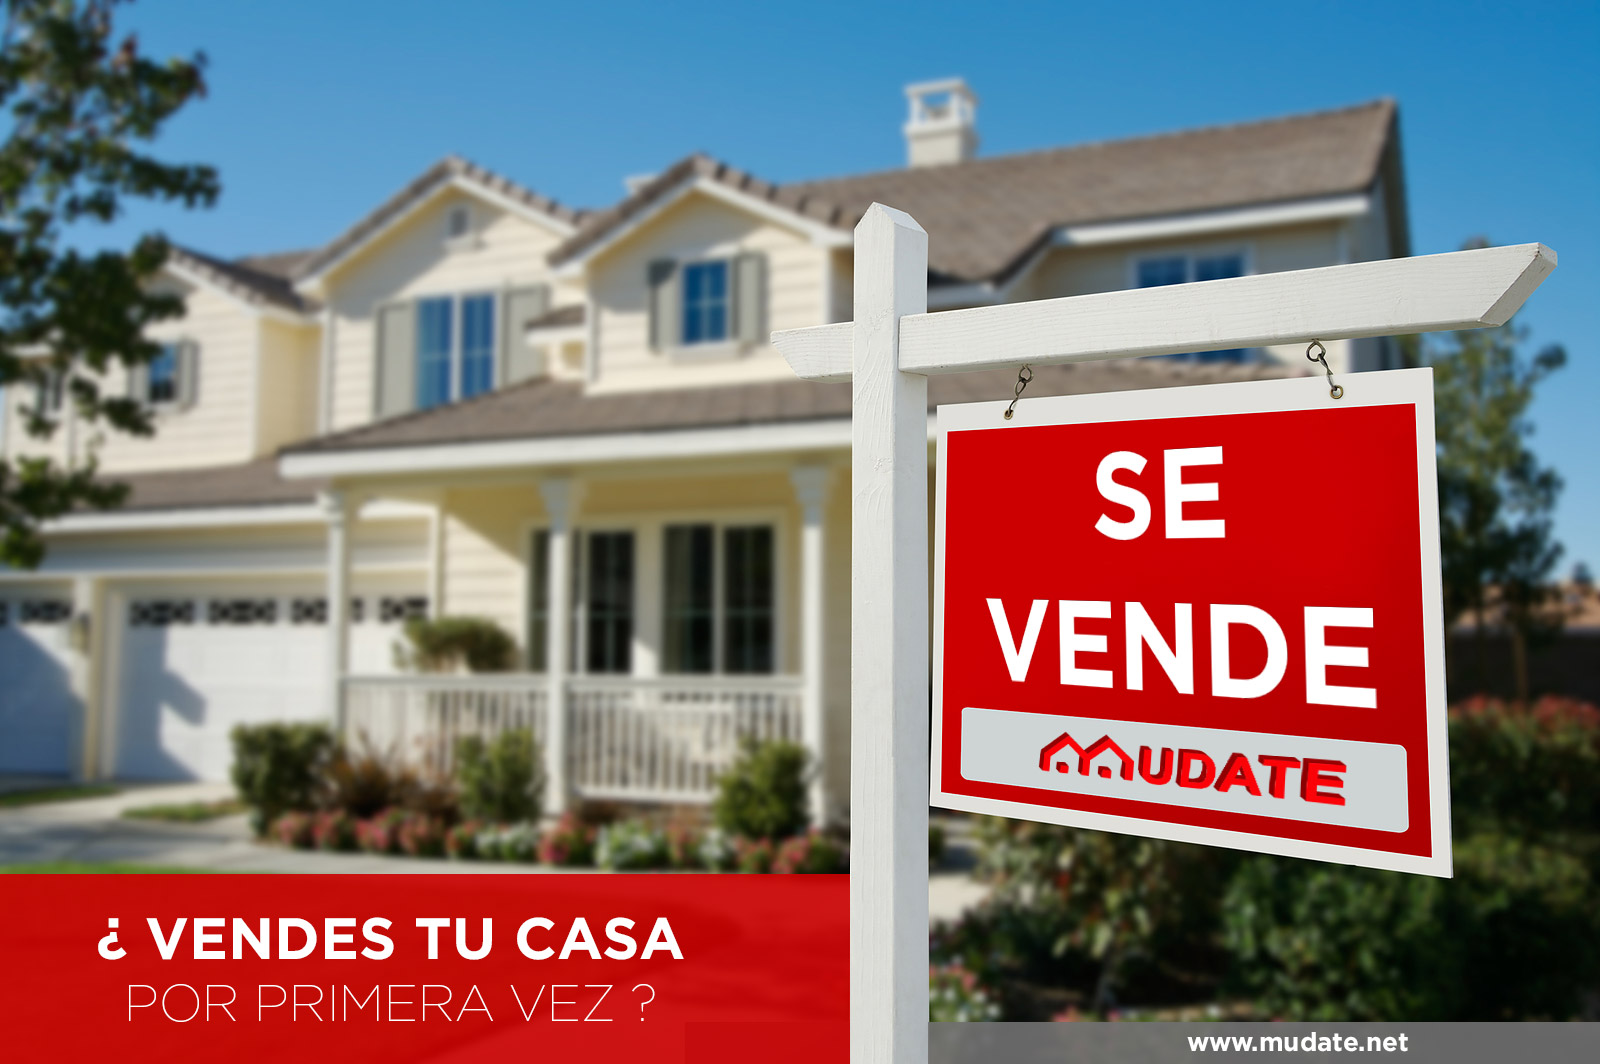 ¿Vendes tu casa por primera vez?